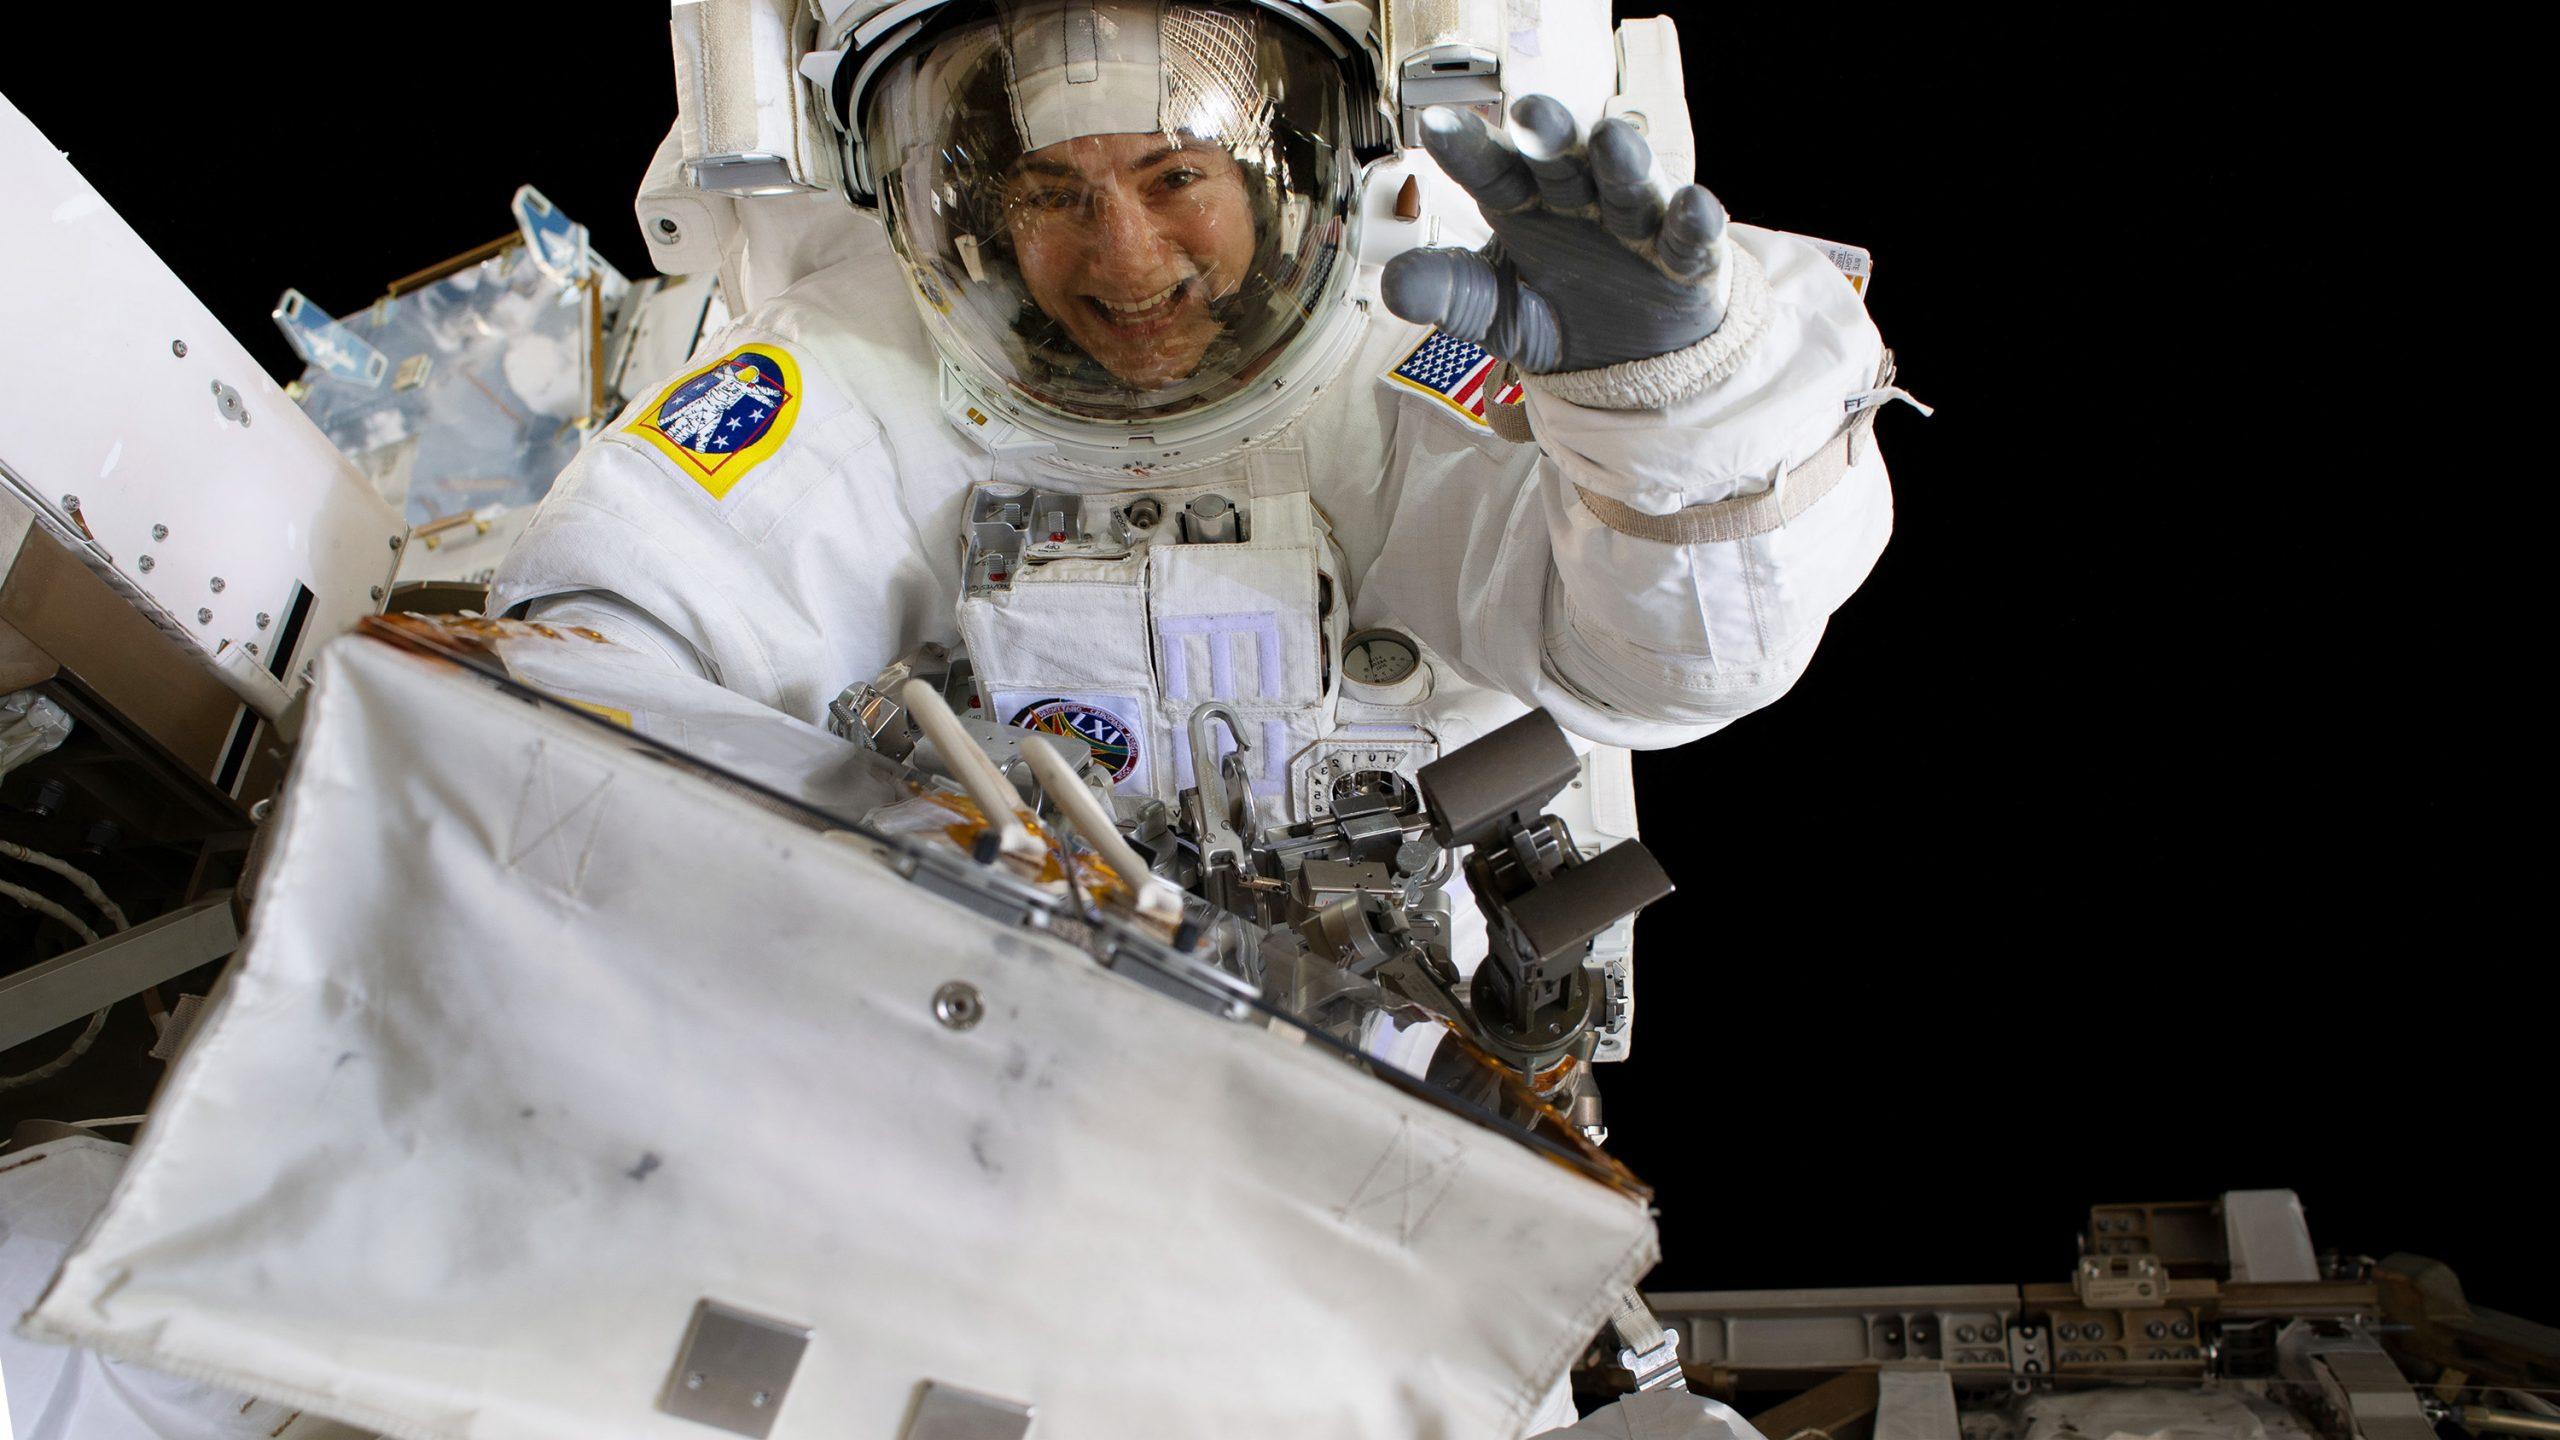 NASAが被曝線量制限の緩和を検討、女性宇宙飛行士の機会開く